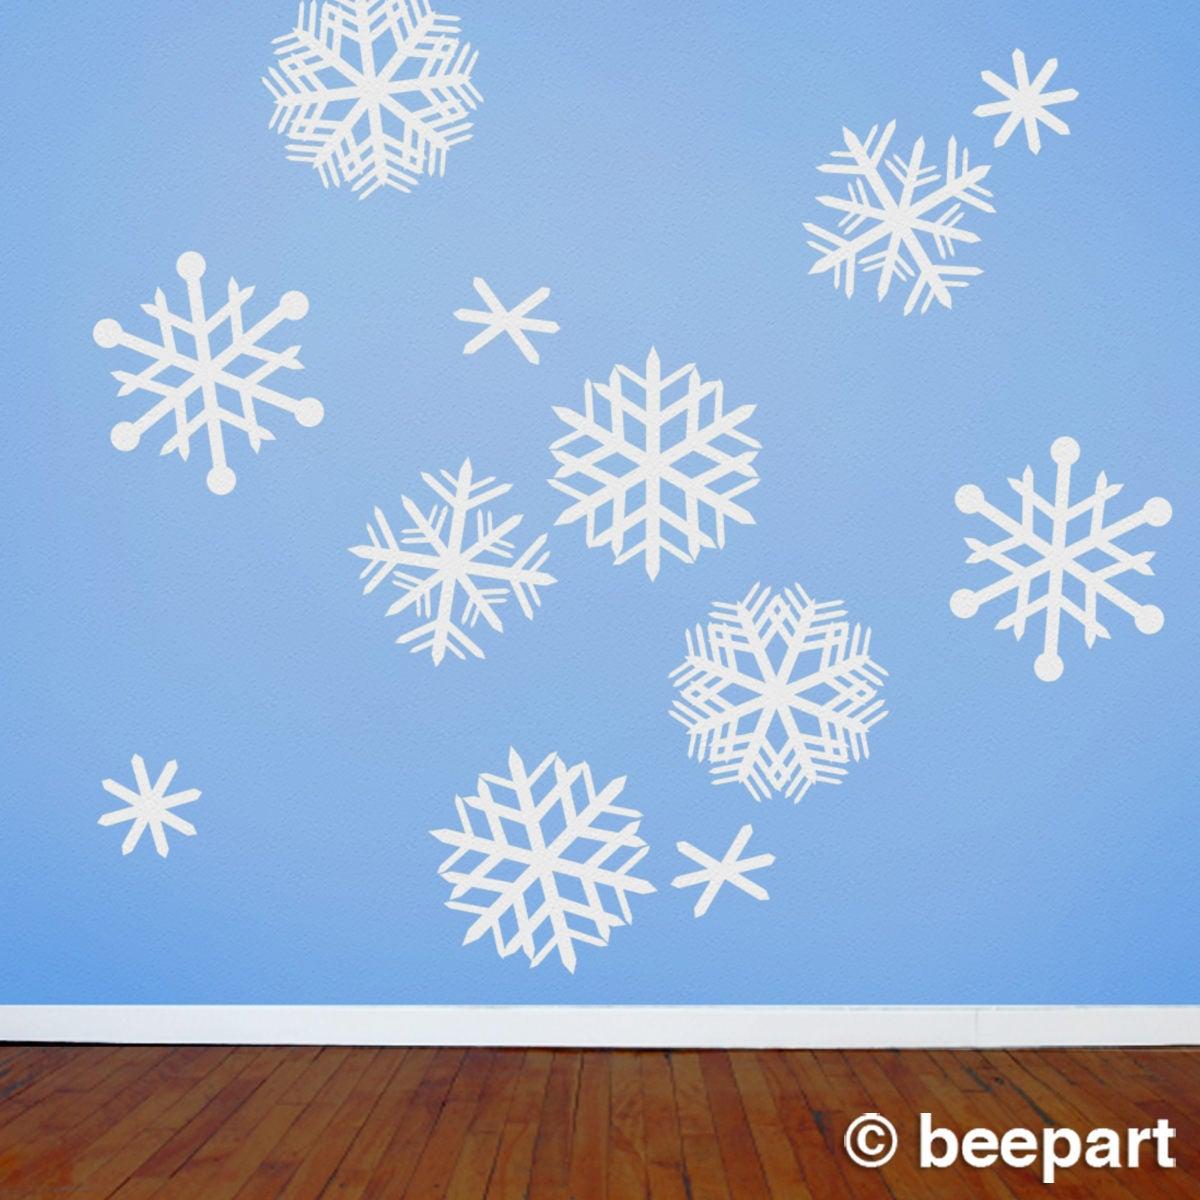 Beau Snowflakes Wall Decals, Mid Century Snowflakes, Vintage Style Snowflakes,  FREE SHIPPING